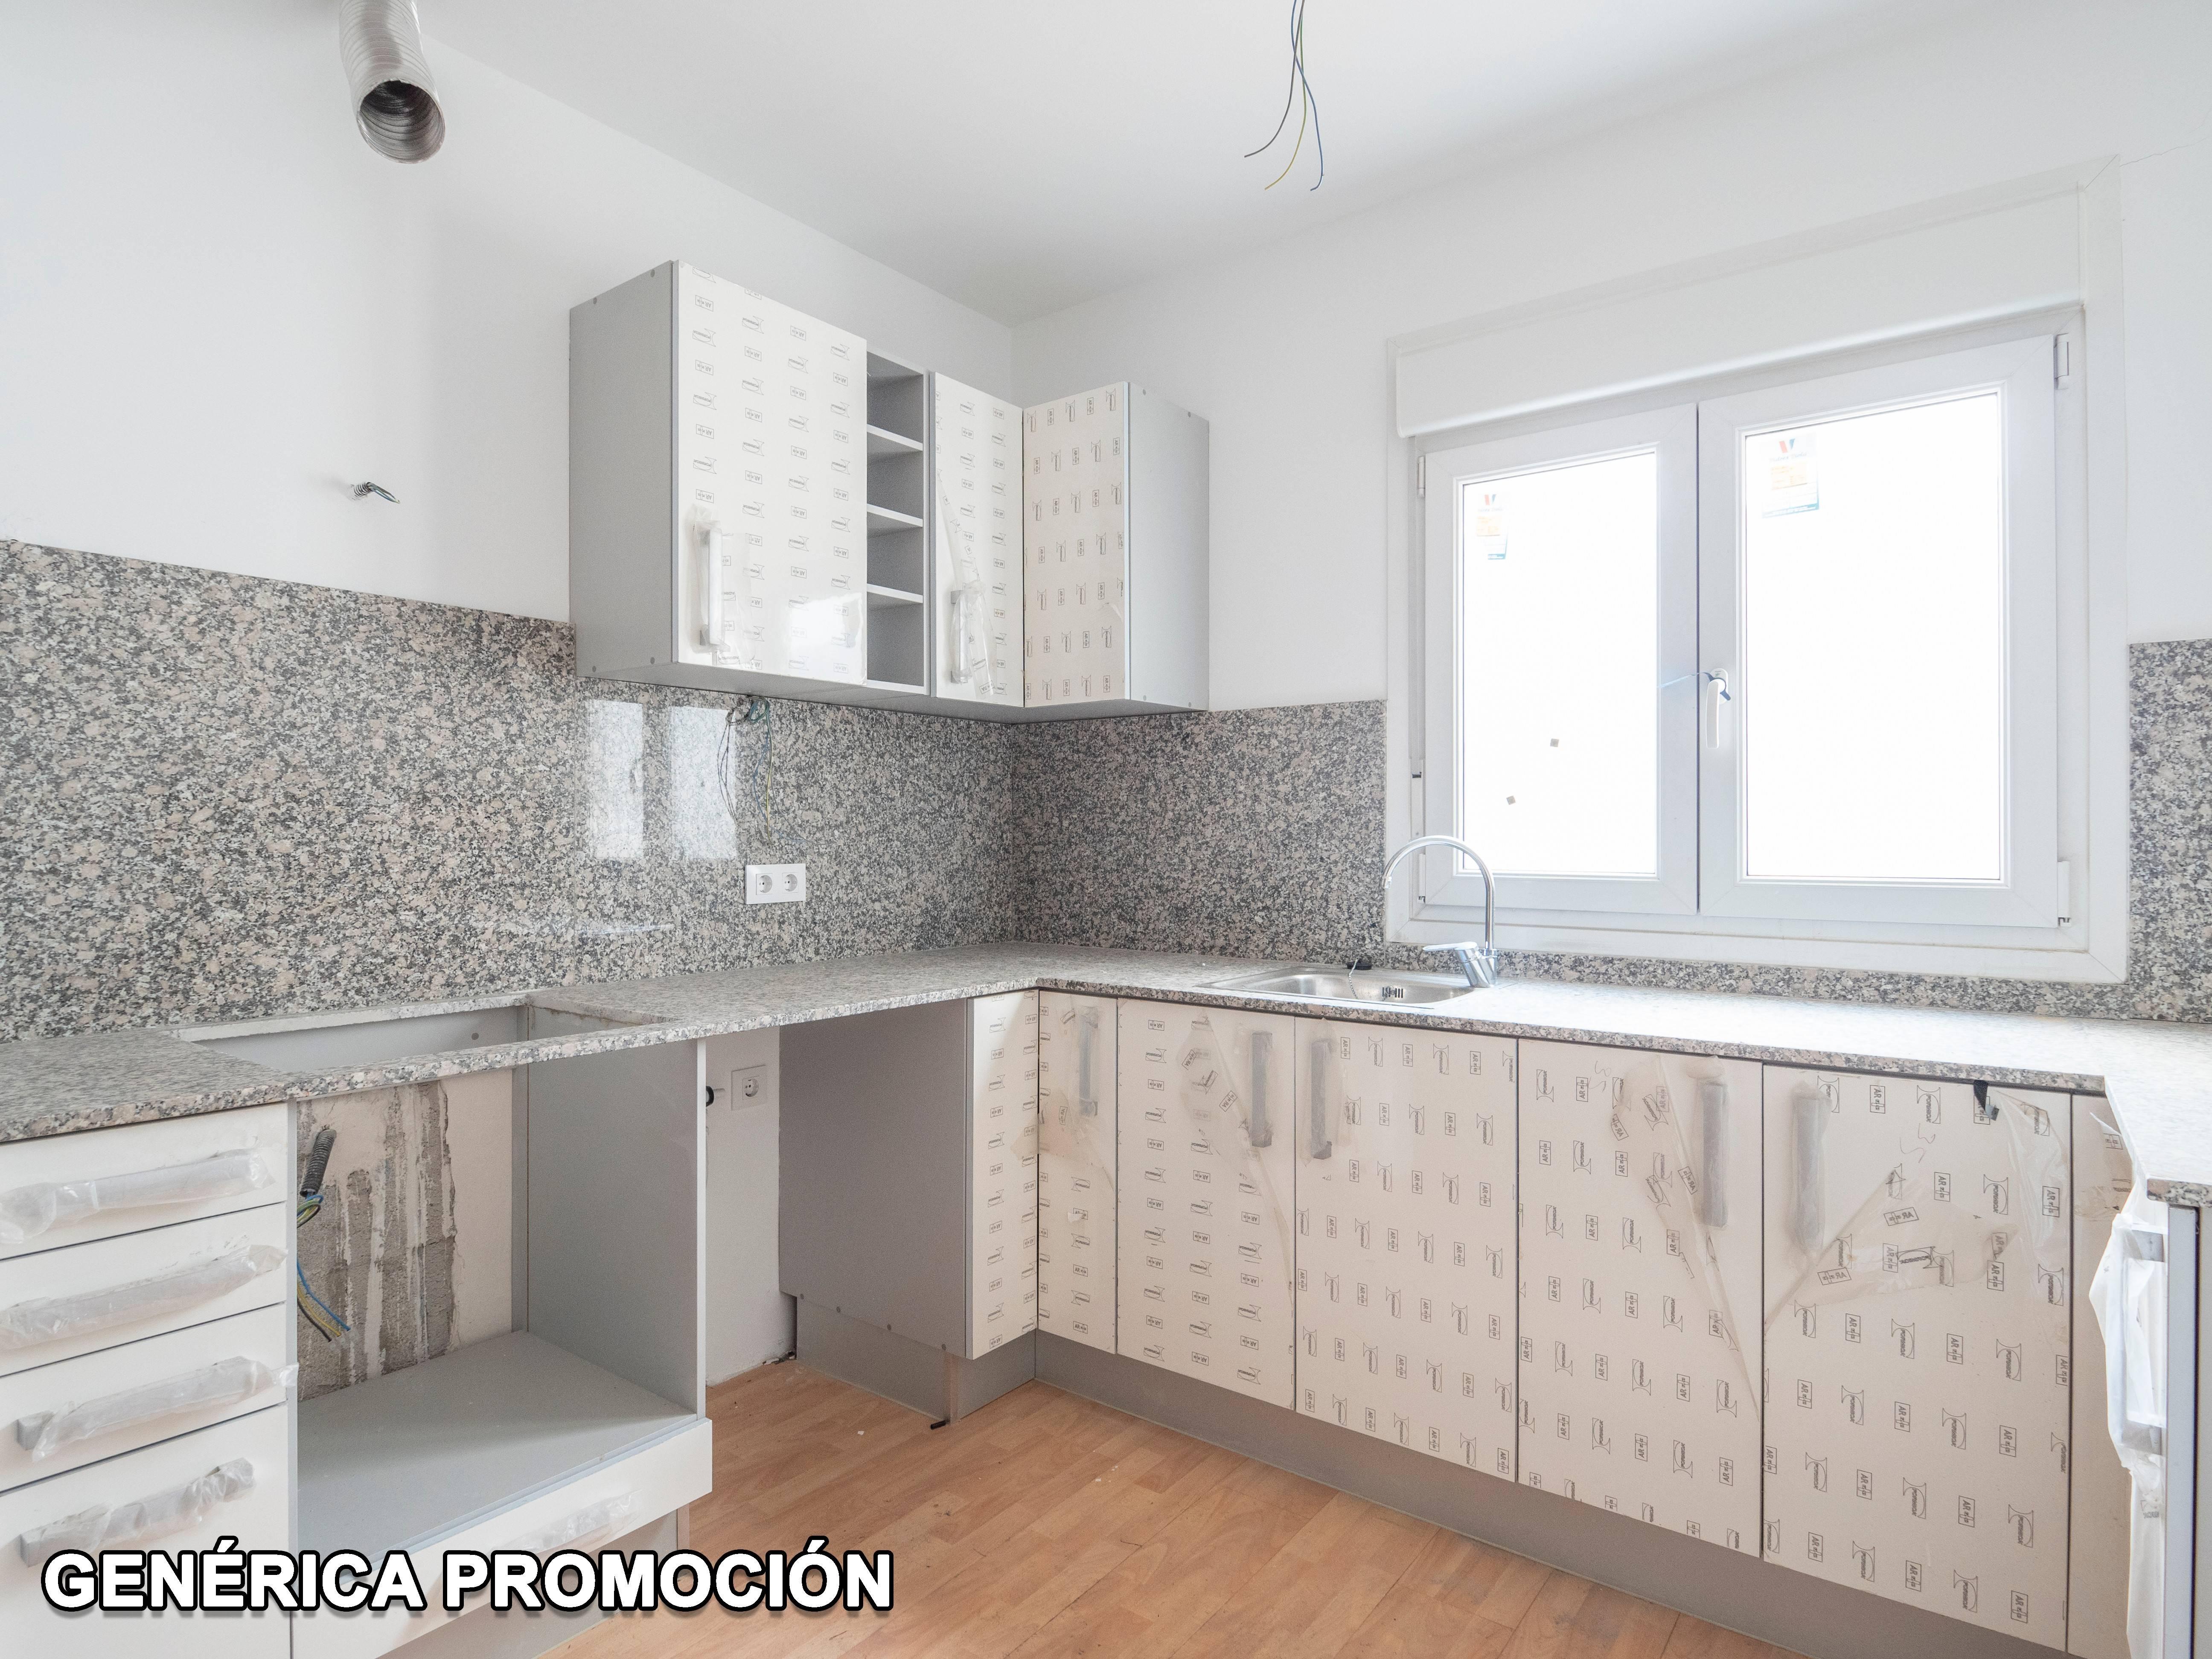 New development - Newly built apartments/flats in the area of Avenida Menorca, Mahon